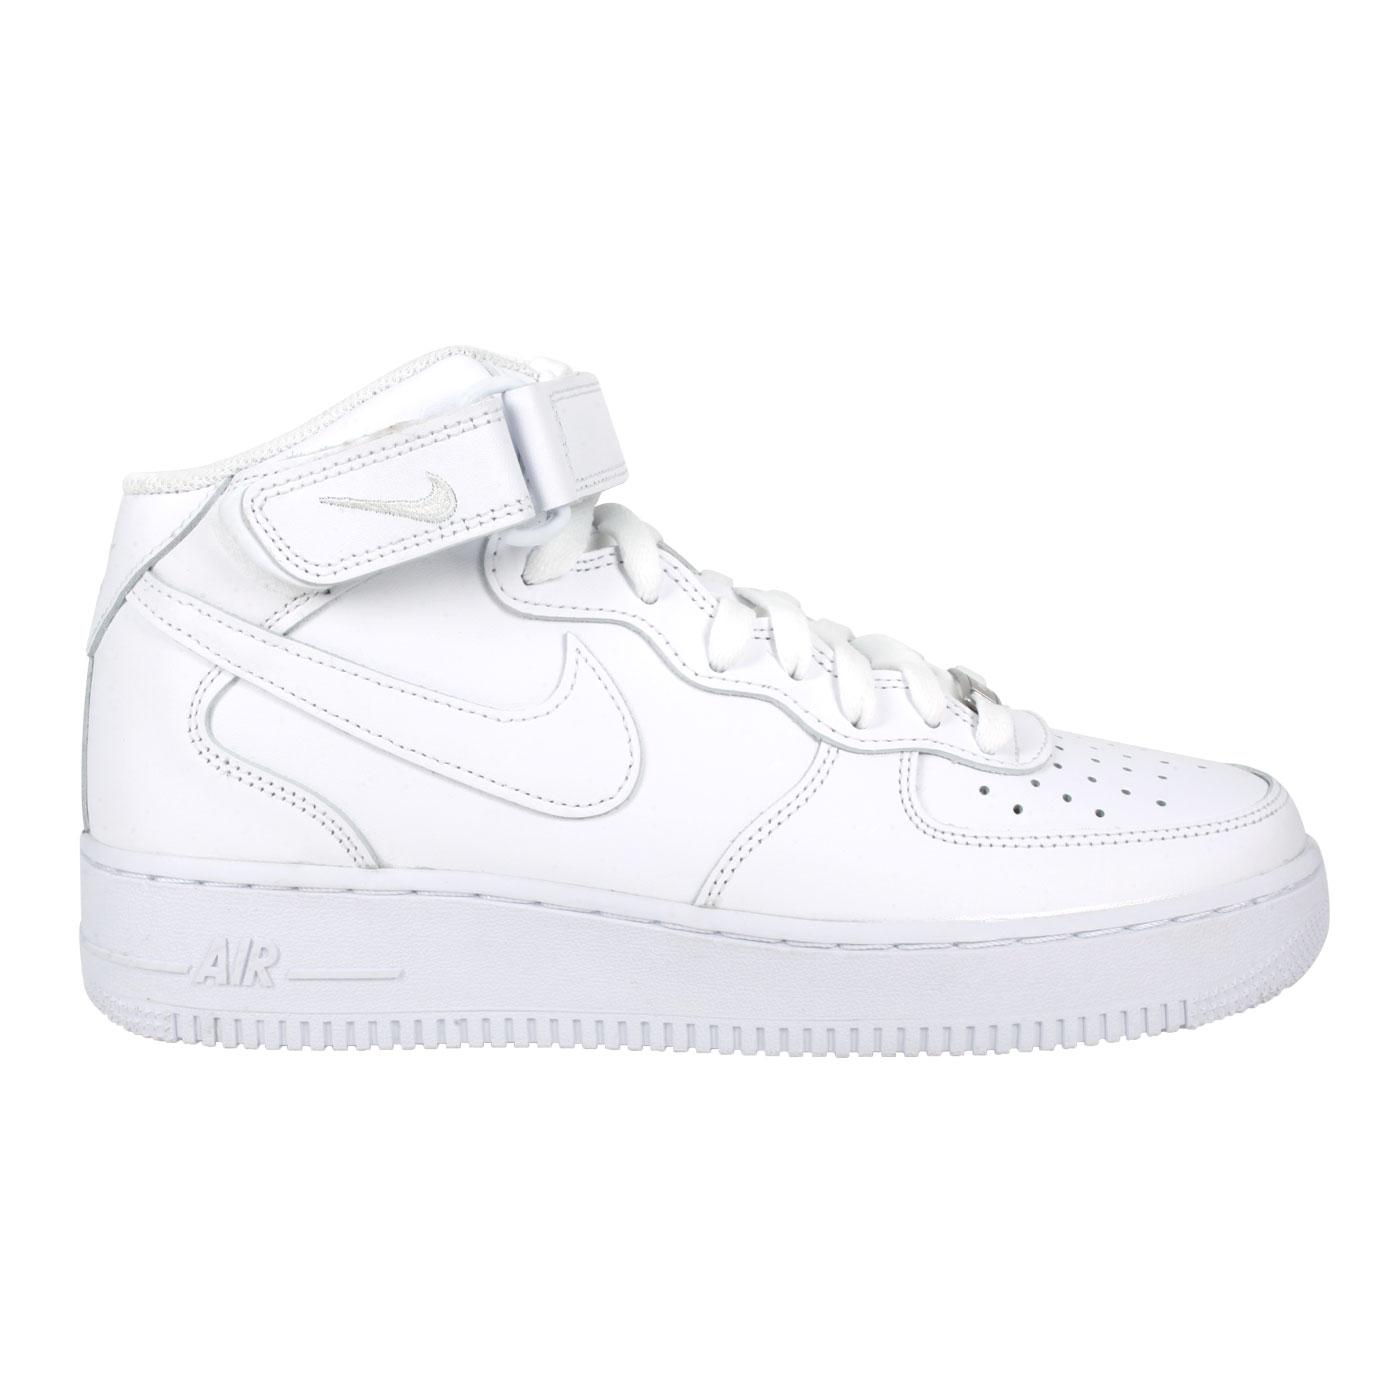 NIKE 男款休閒鞋  @AIR FORCE 1 MID '07@CW2289111 - 白